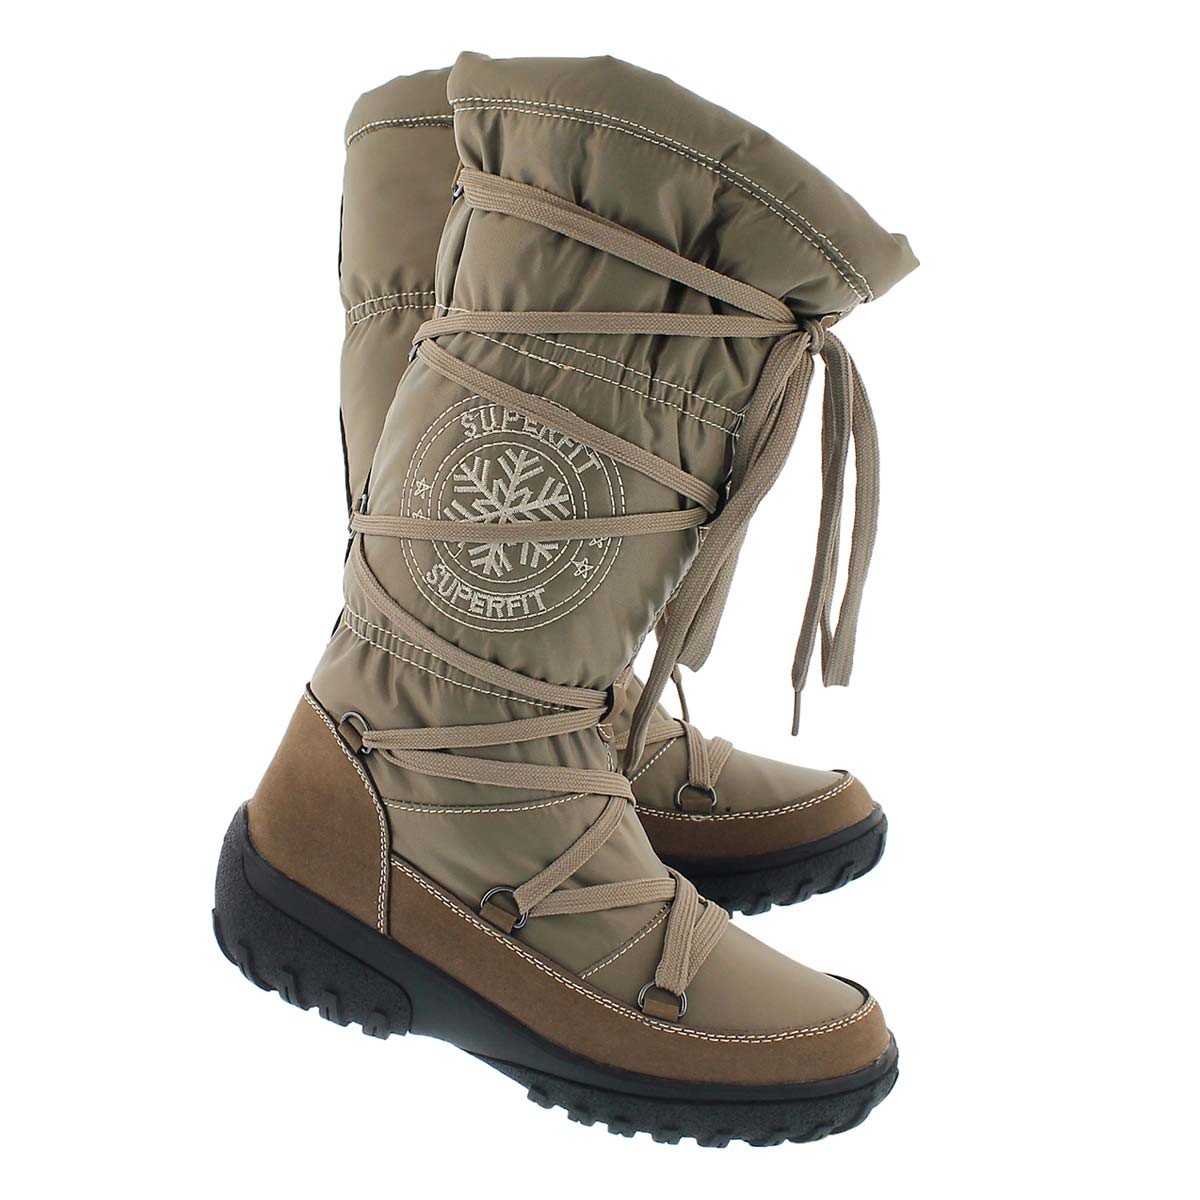 Lds Shayne sand wtrpf tall winter boot